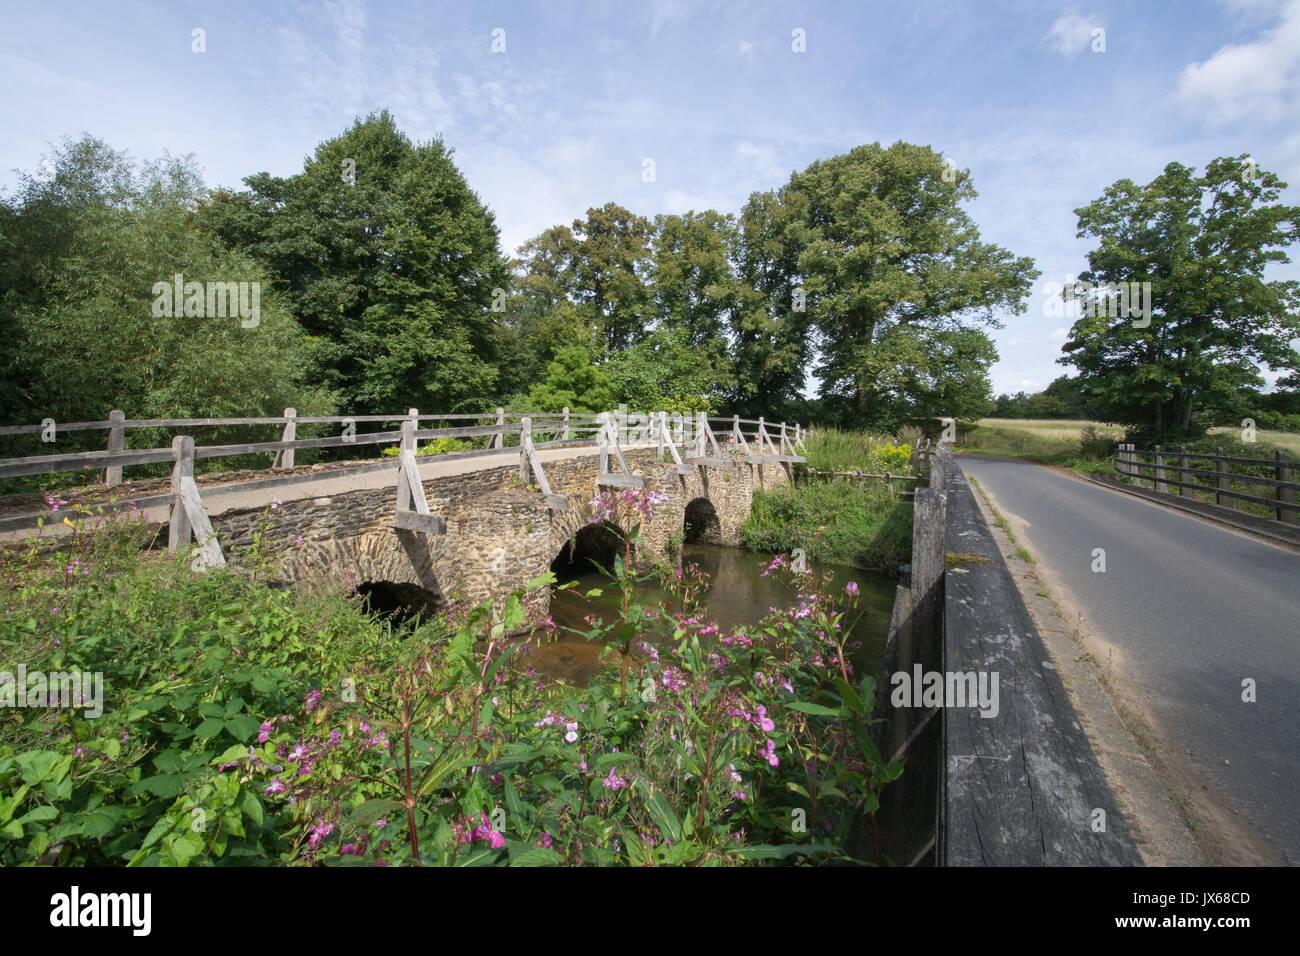 Medieval bridge over the River Wey at Tilford village in Surrey, UK - Stock Image